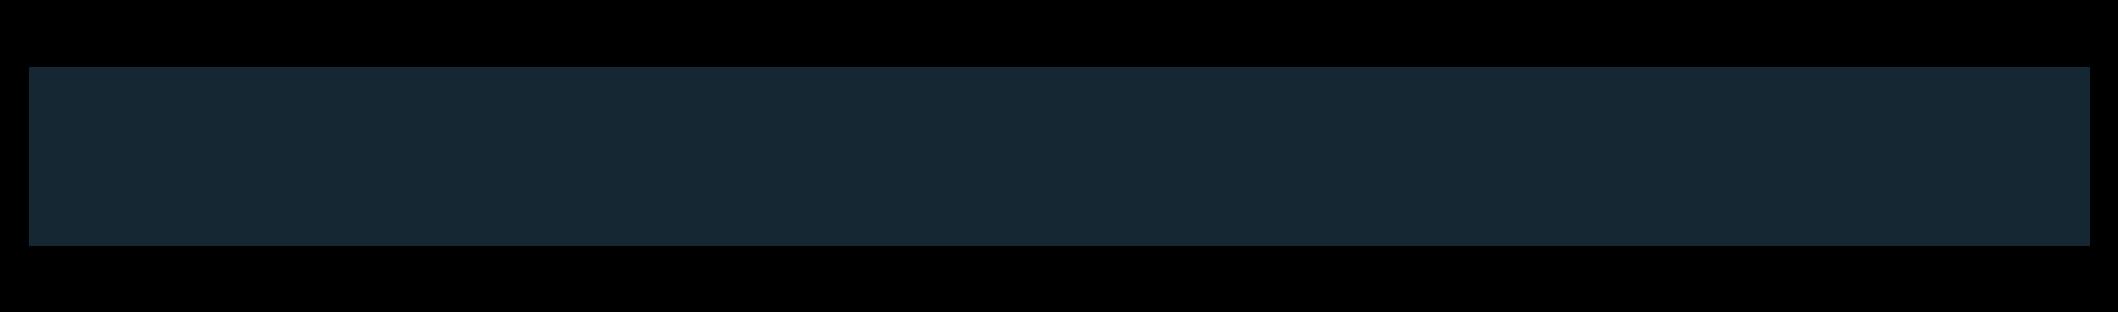 logo-raymond-james